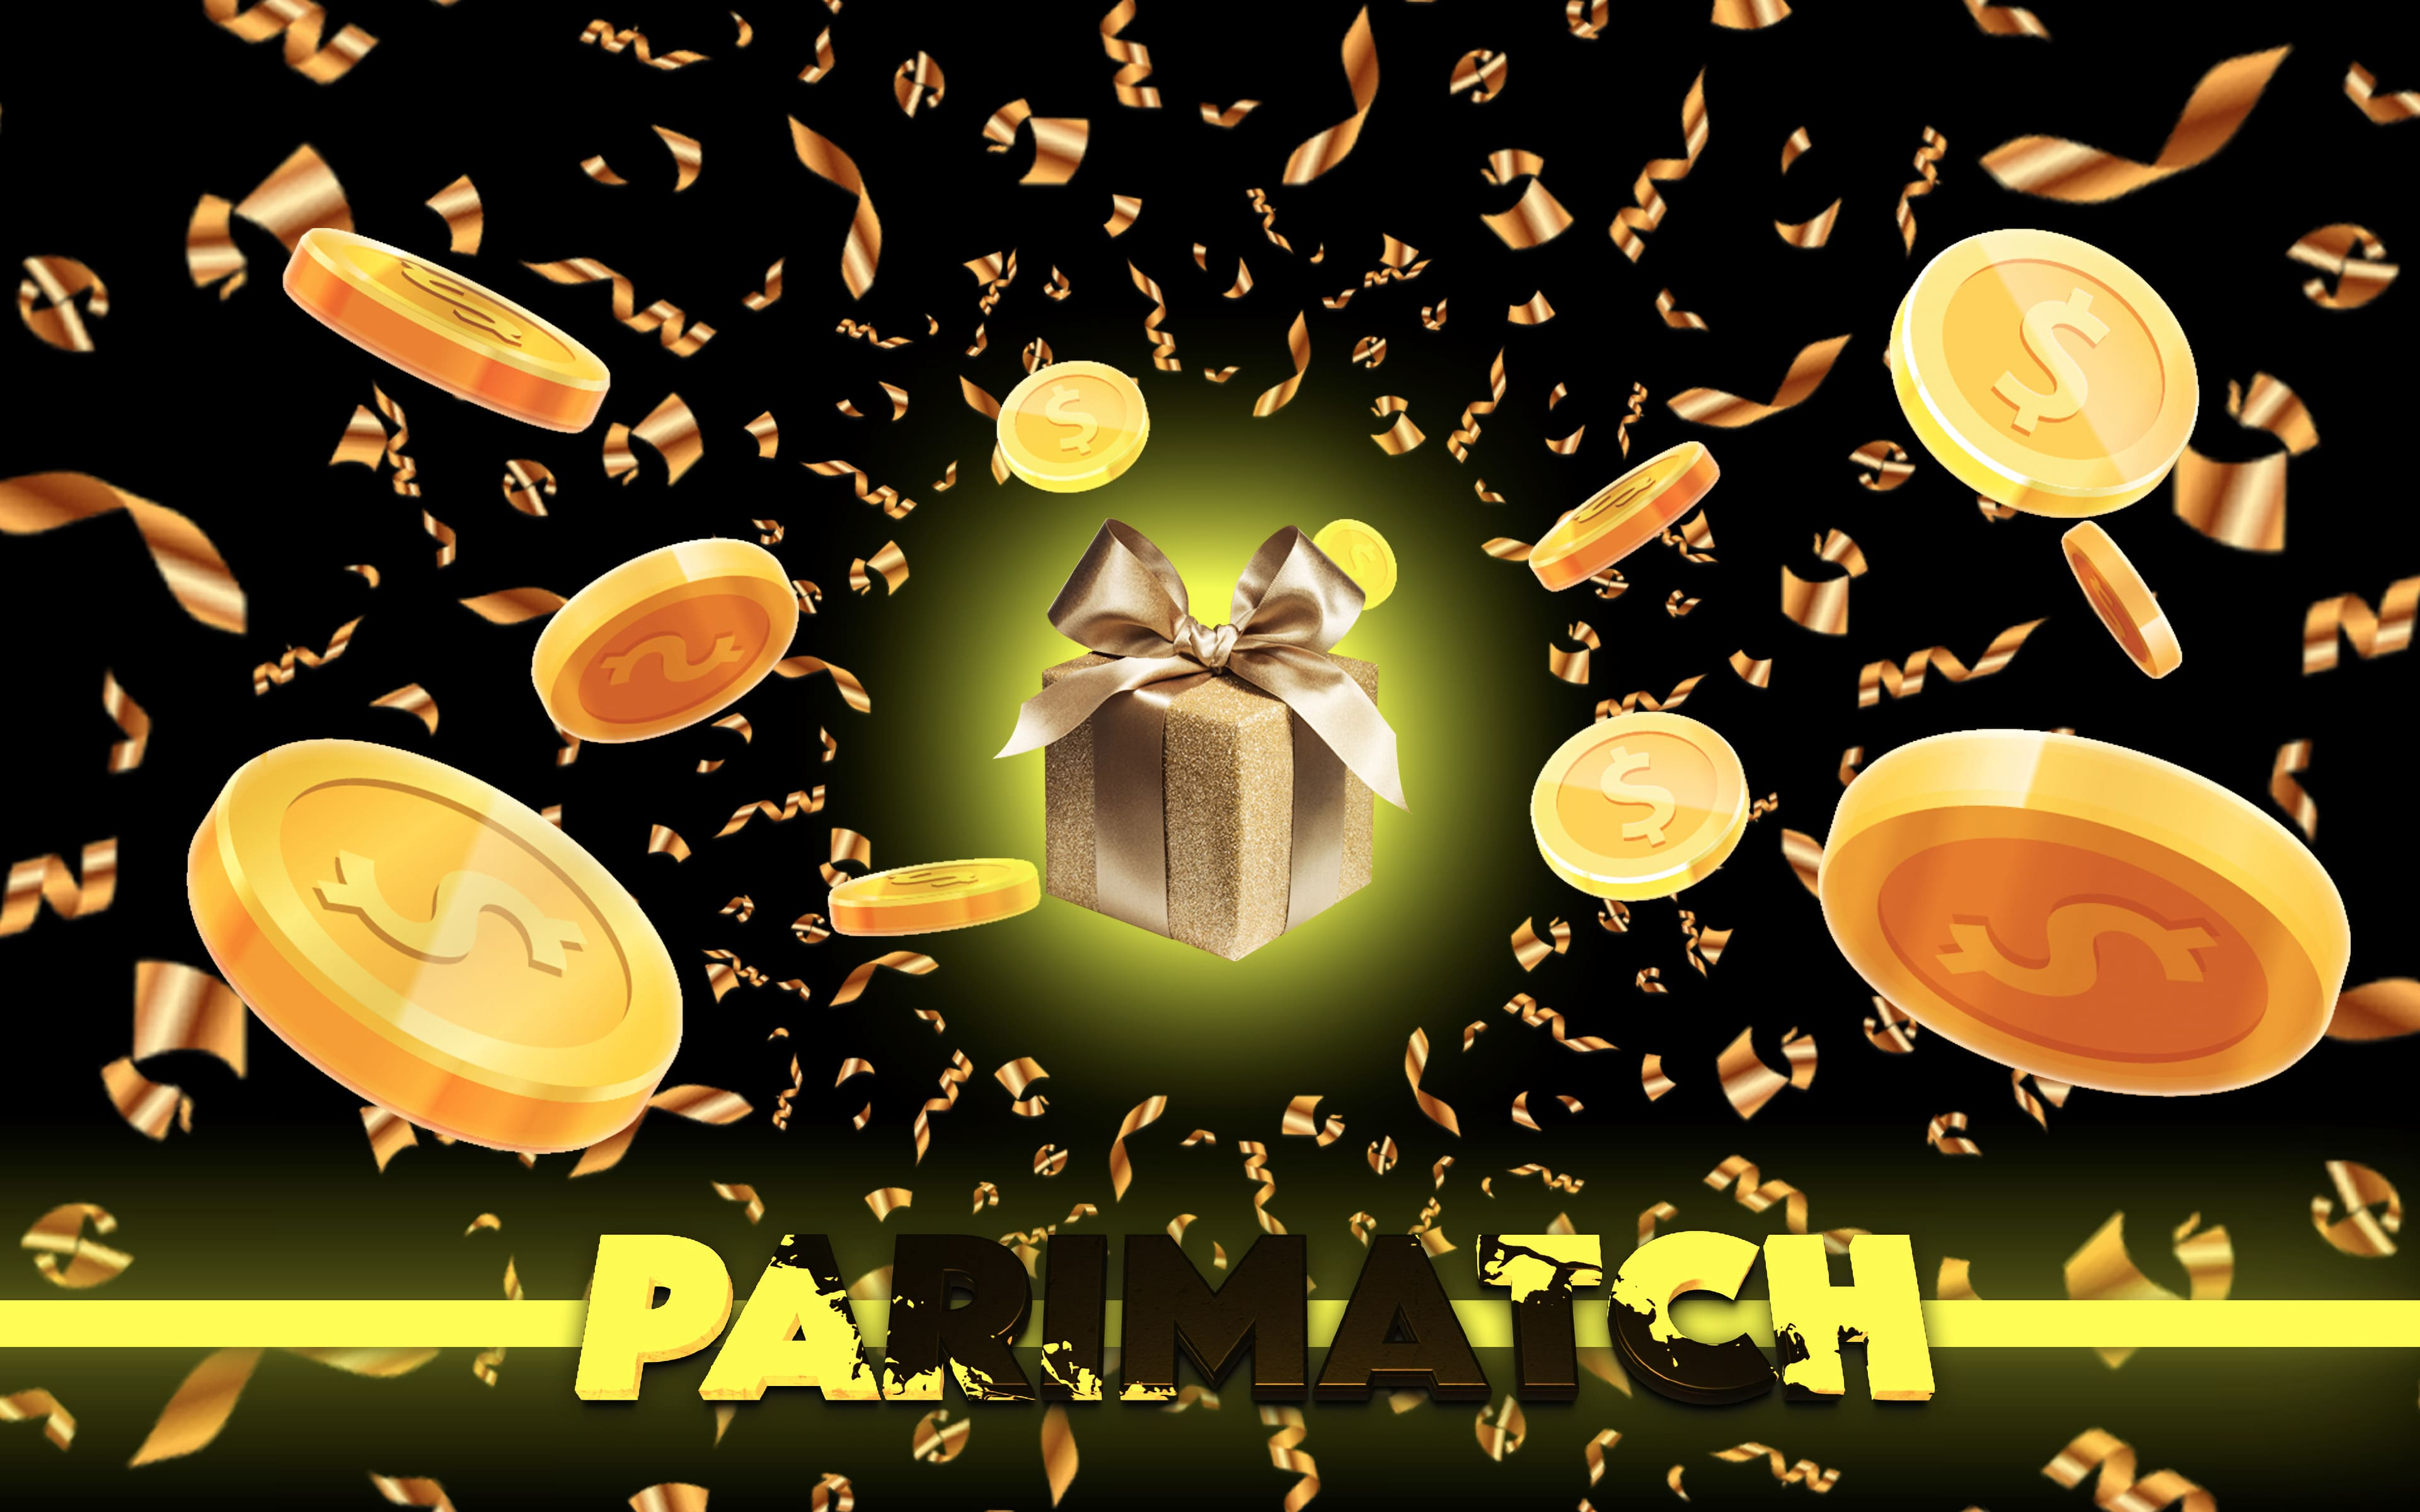 Parimatch Bonuses for new player